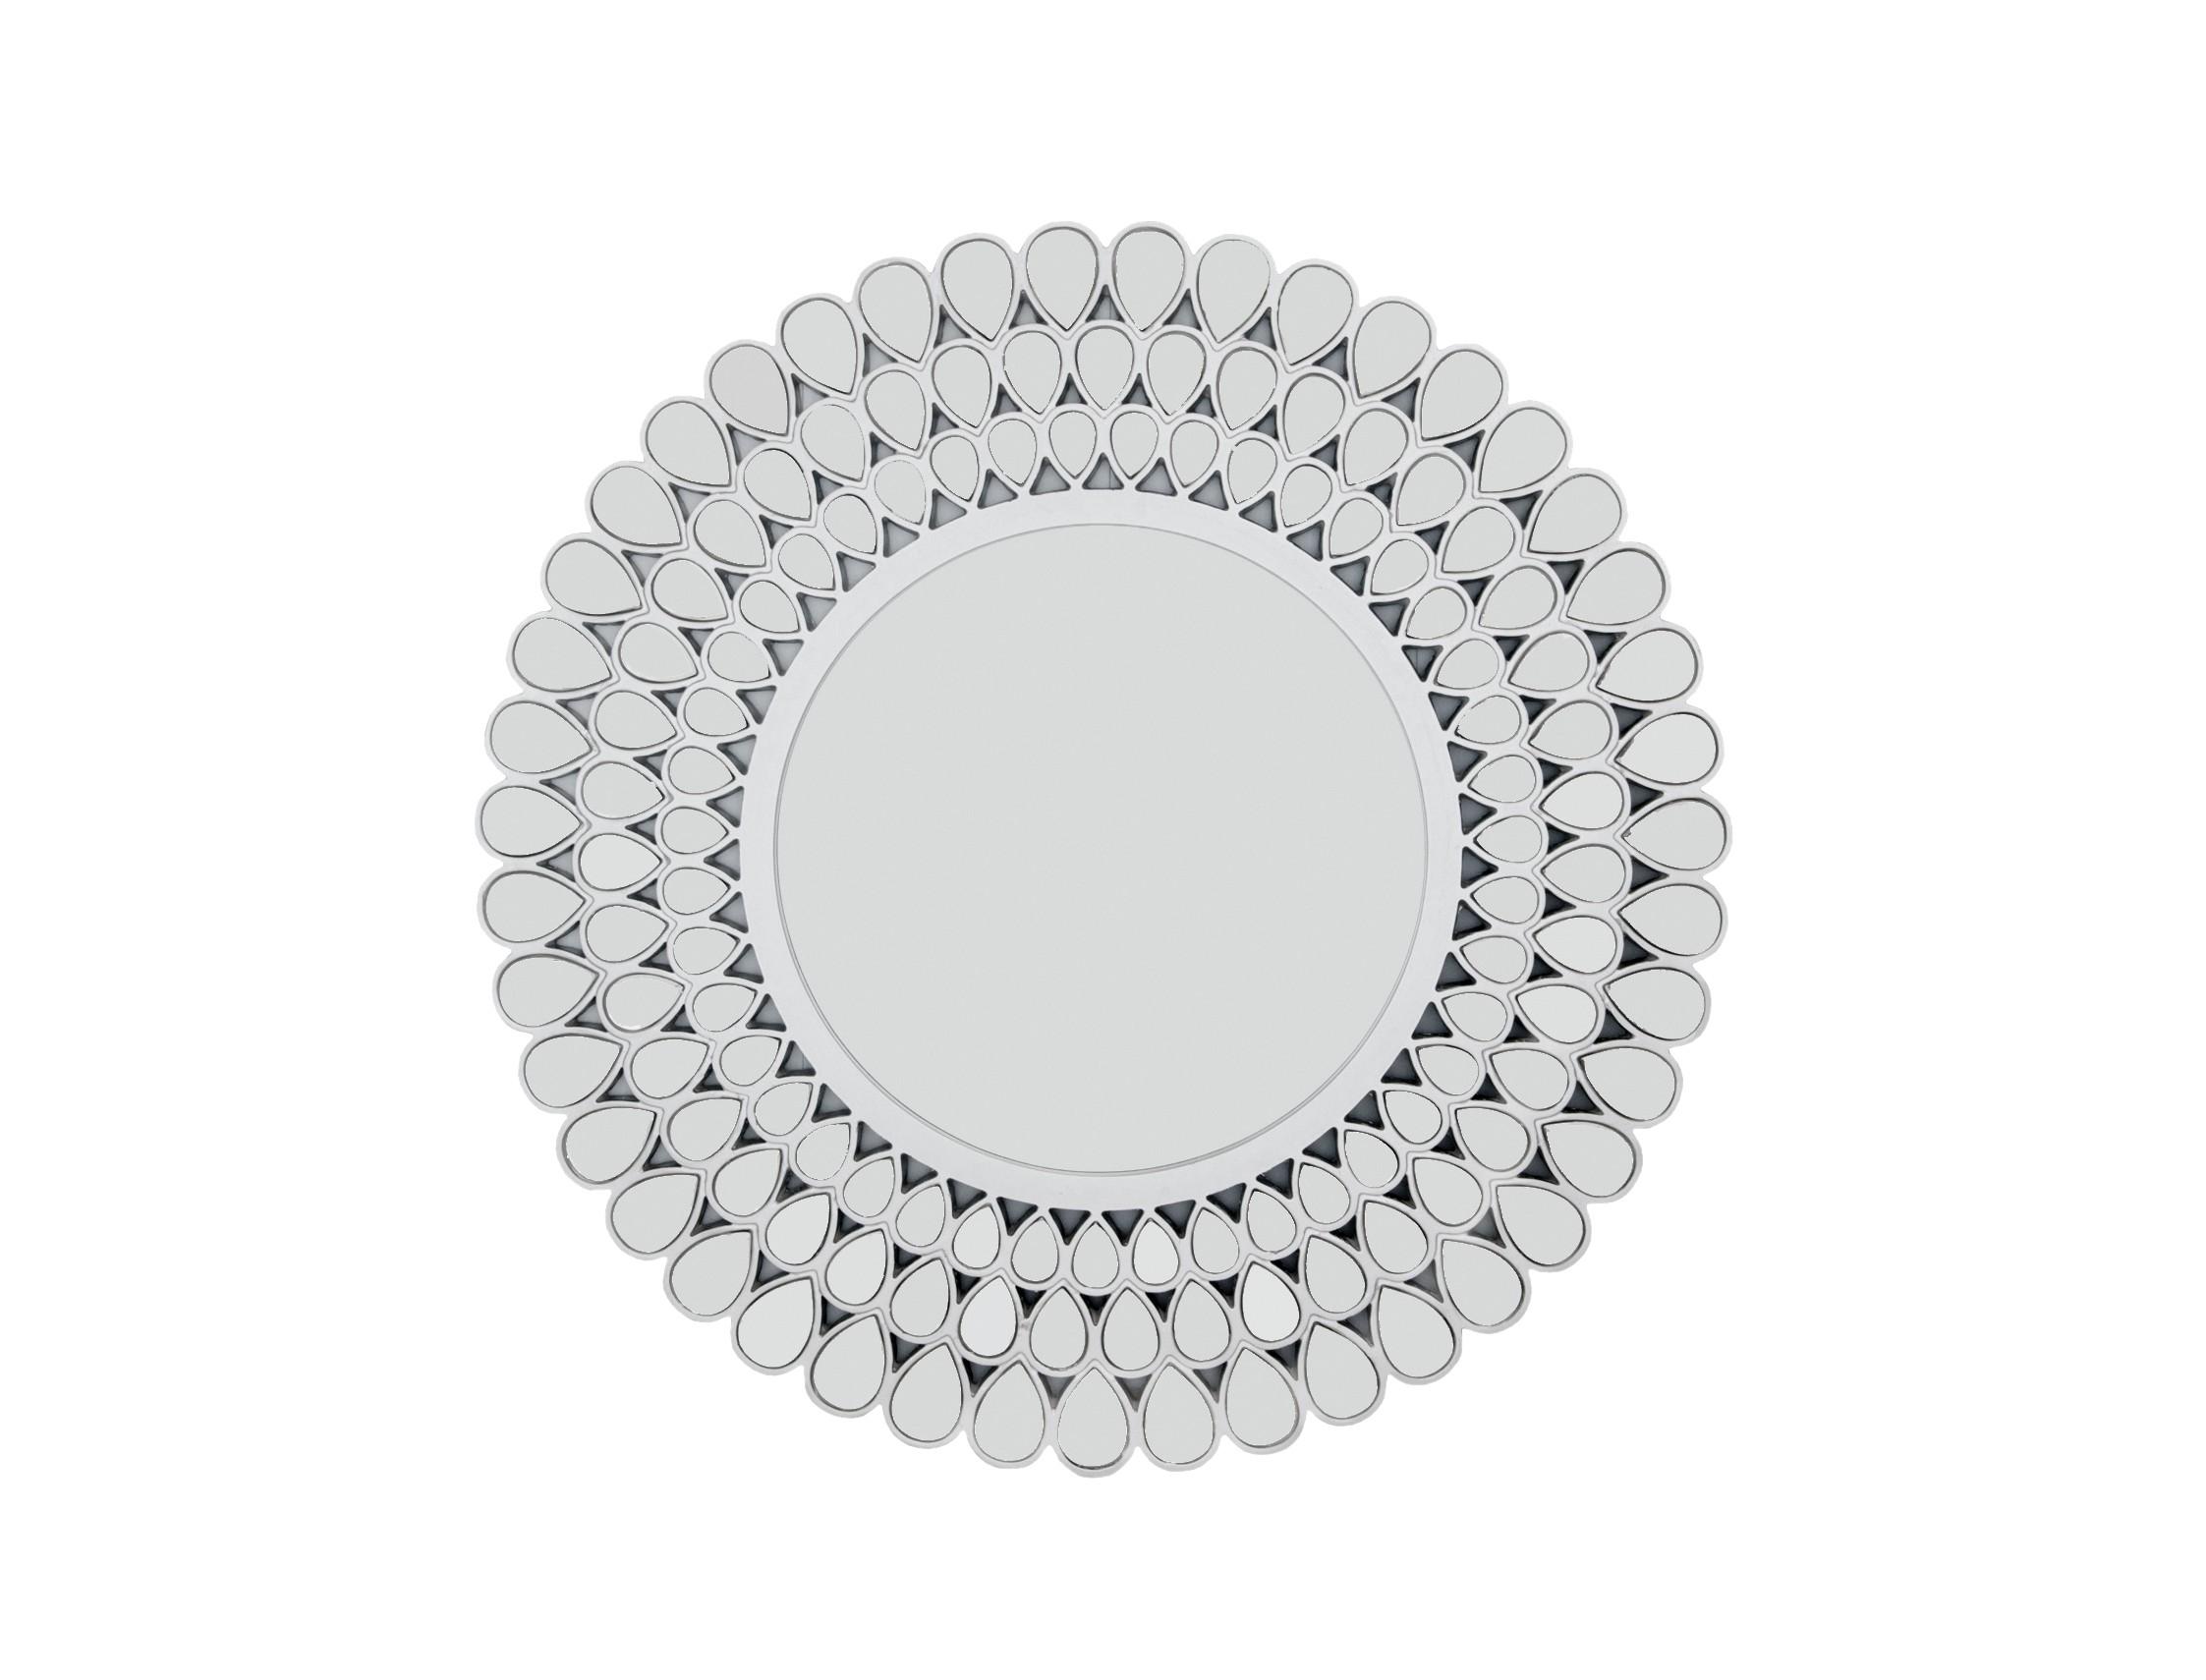 Настенное зеркало AlmontНастенные зеркала<br>Материалы: МДФ, полирезин, стекло<br><br>Material: МДФ<br>Глубина см: 2